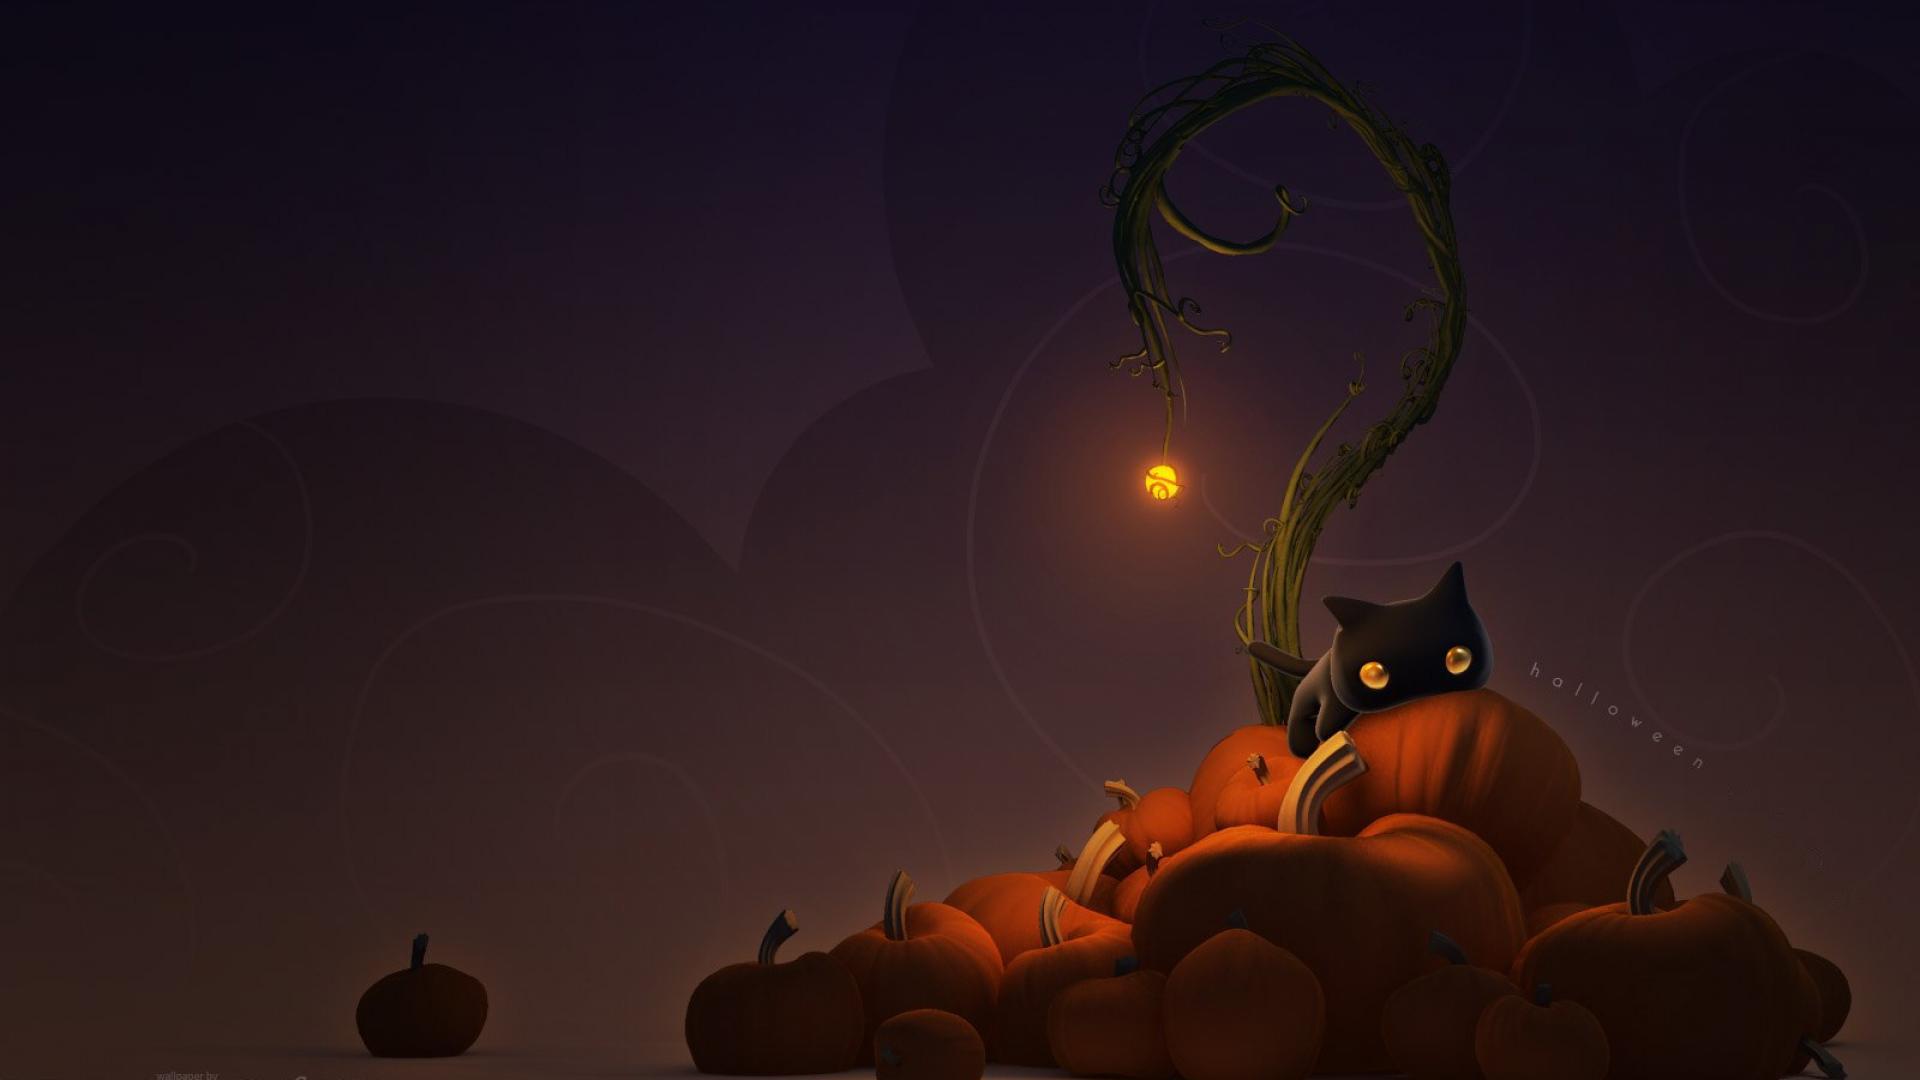 fondos halloween wallpapers gratis - photo #6